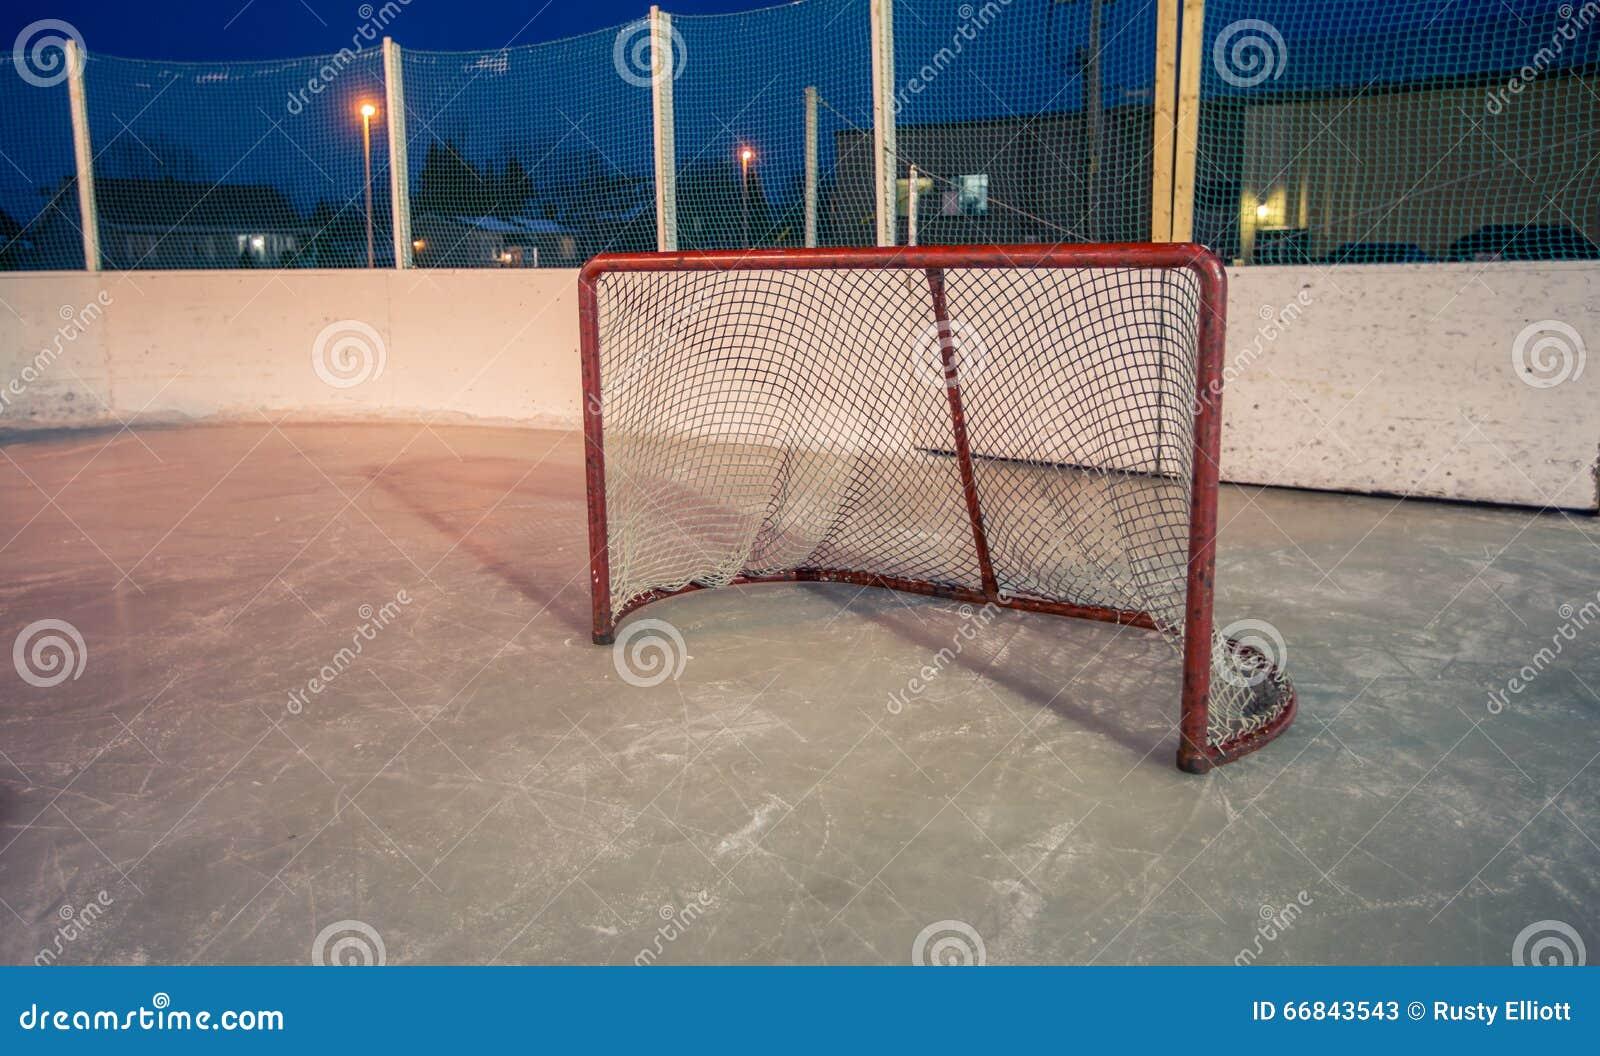 Hockey net stock image  Image of canada, winter, lights - 66843543